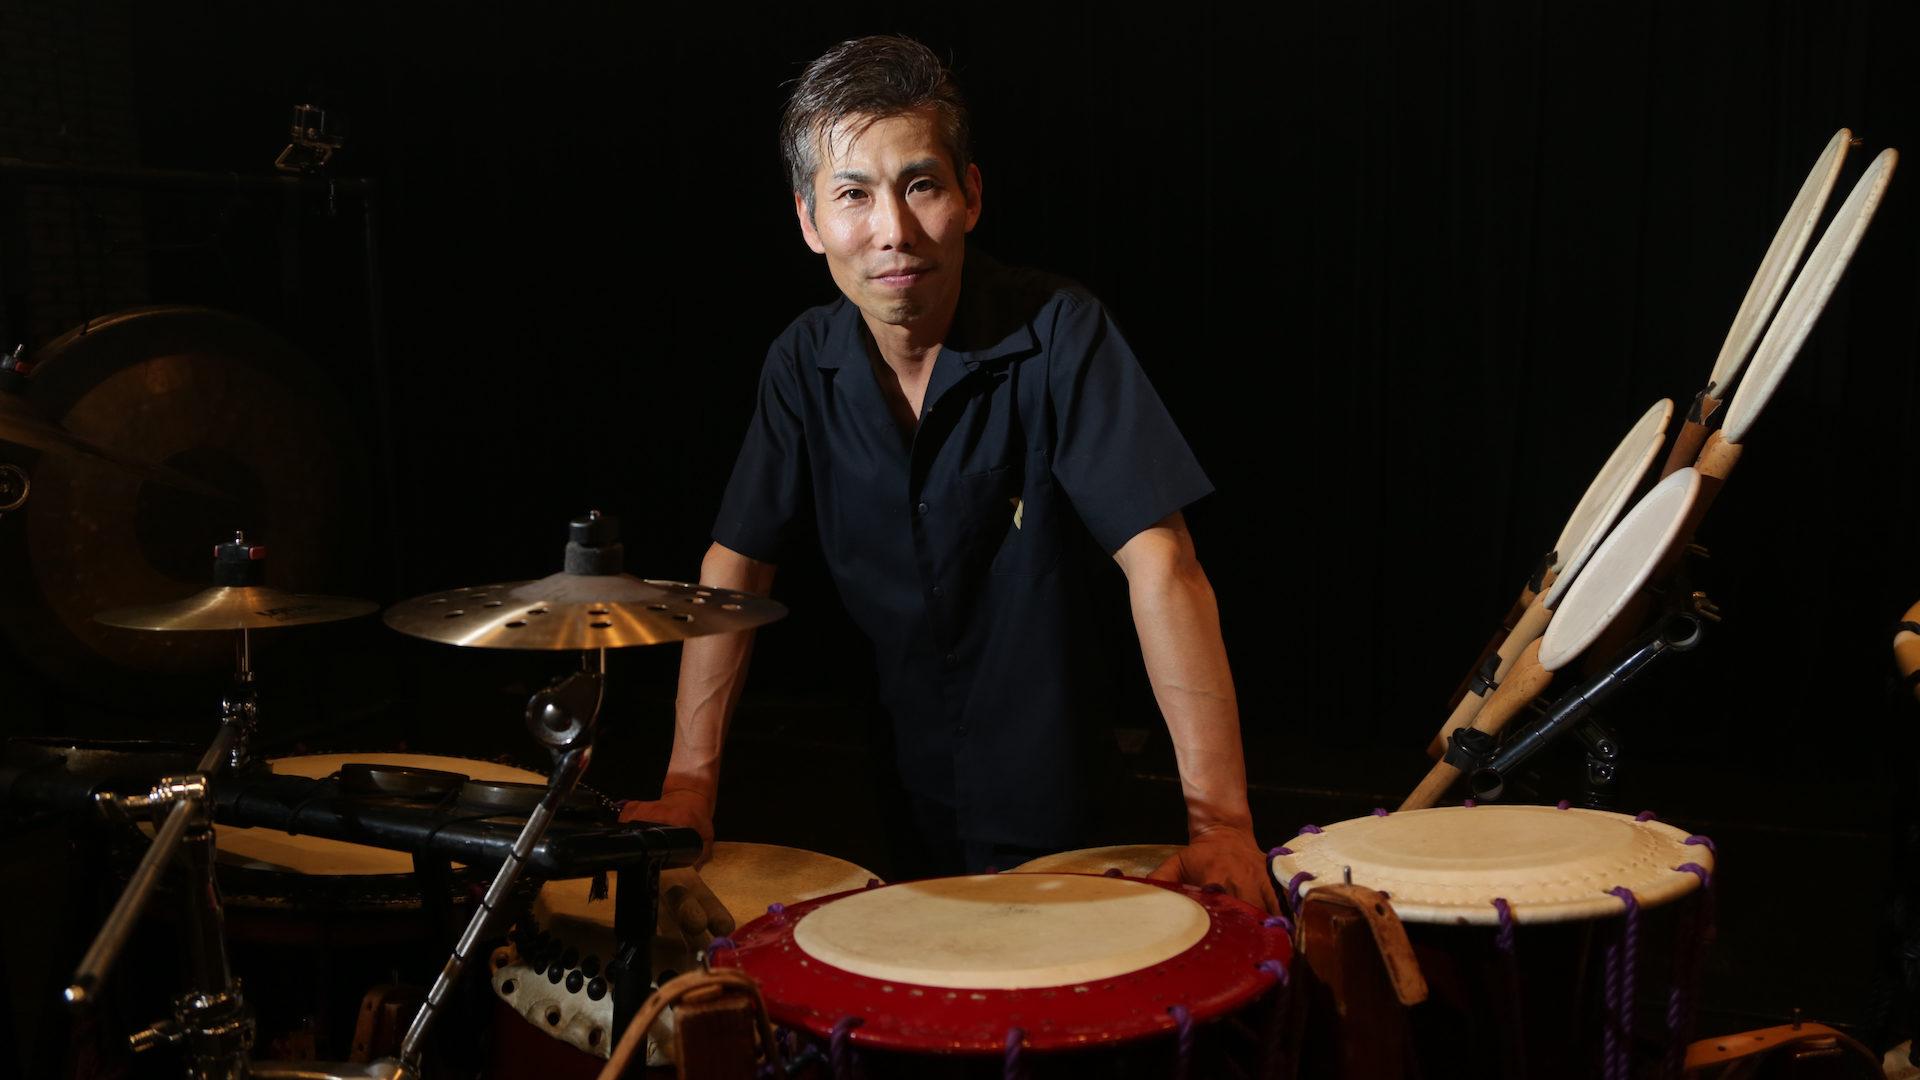 Masaki Otawa 大多和正樹 (Japanese taiko player - 和太鼓奏者) [OV_4]_web